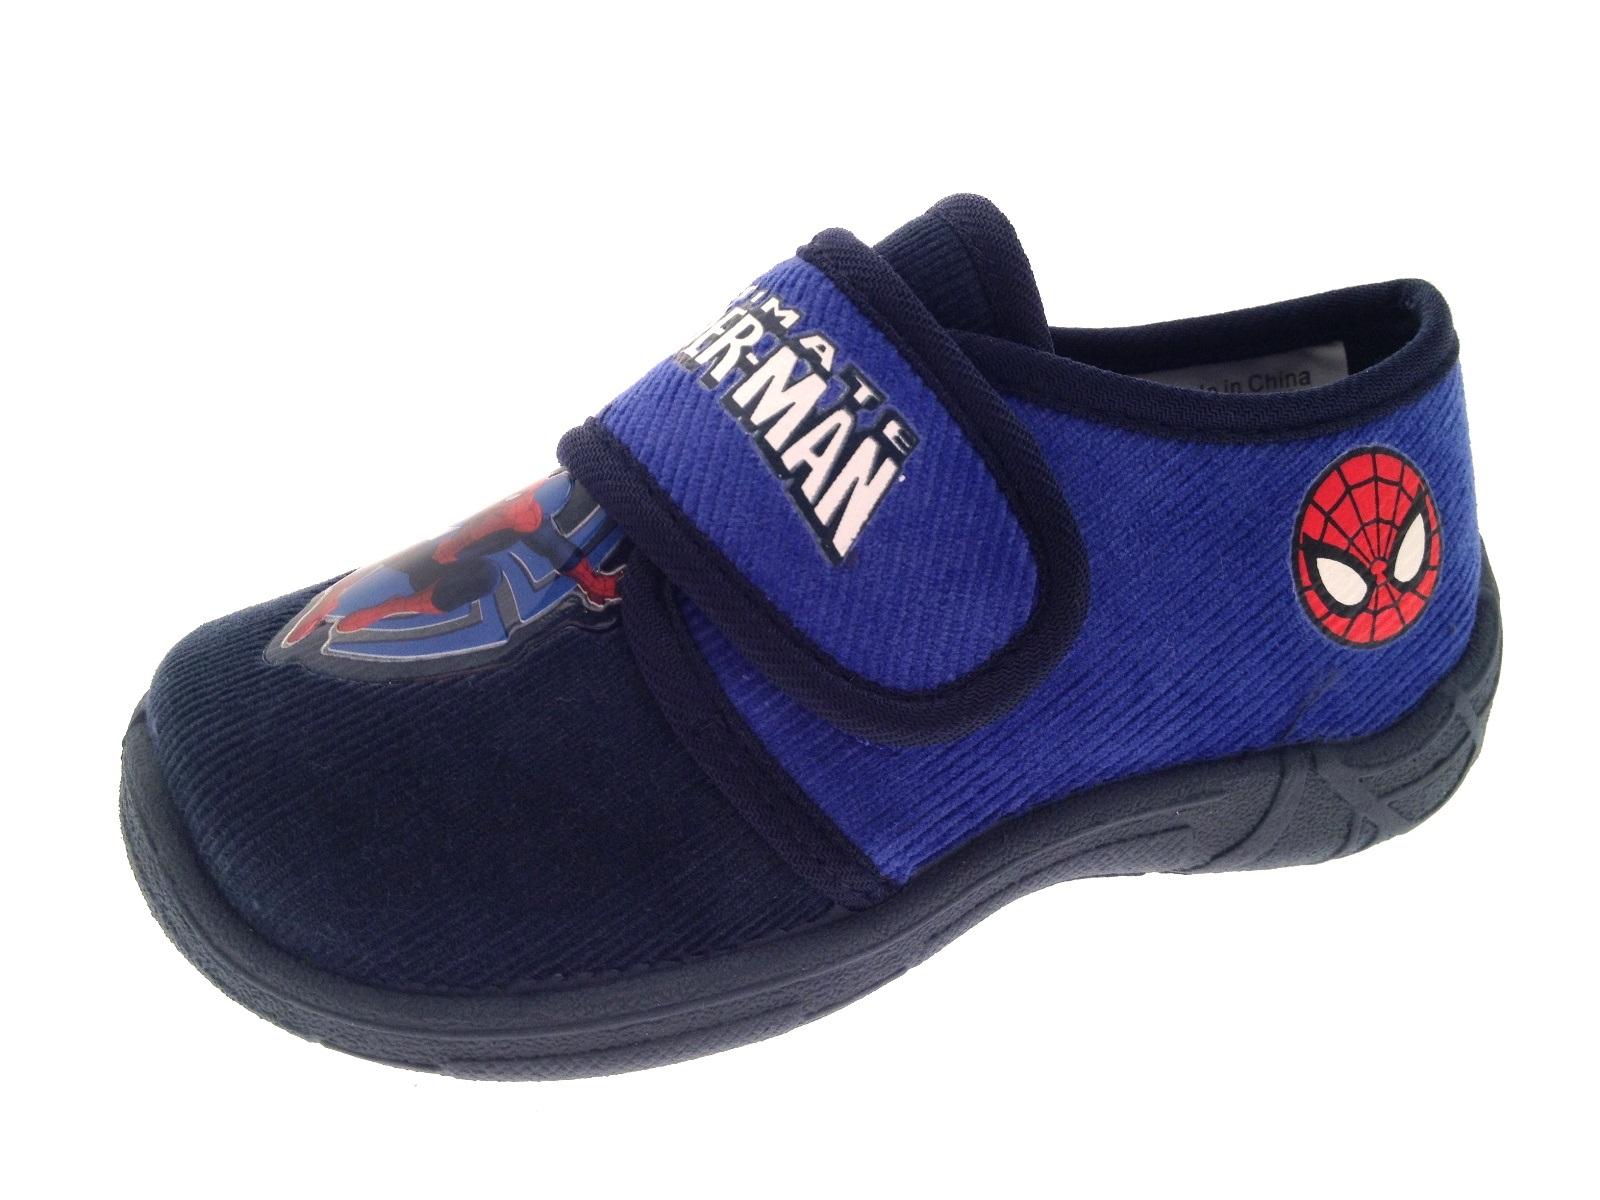 MARVEL ULTIMATE SPIDERMAN Pantofole Kids Bambini Ragazzi Scarpe Velcro Taglia UK 6,3